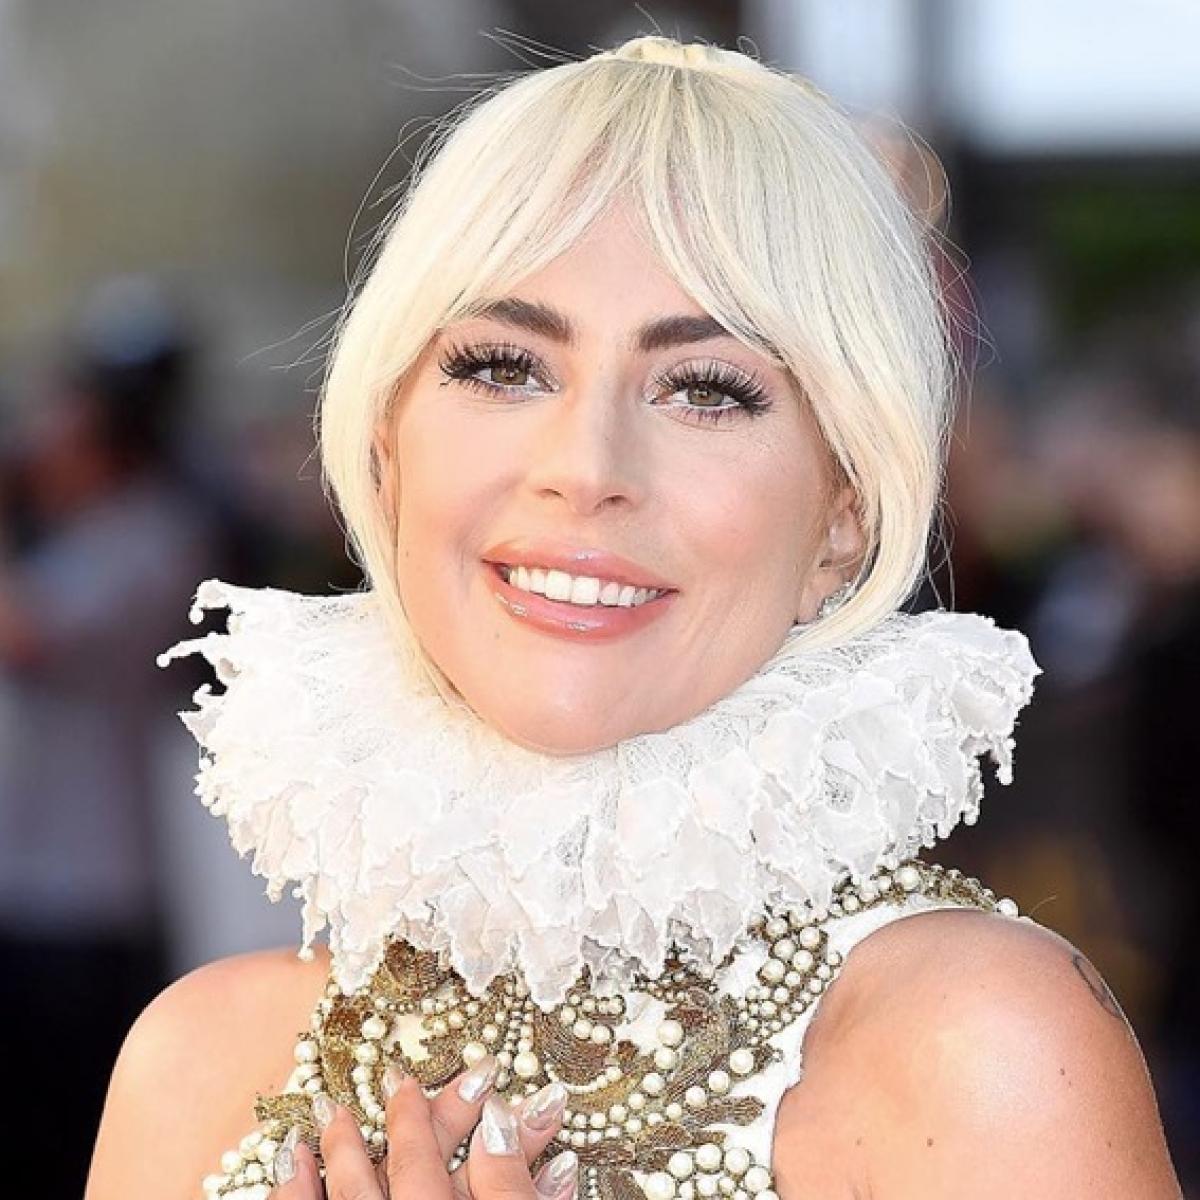 Lady Gaga shares her 'Stupid Love' selfie with boyfriend Michael Polansky